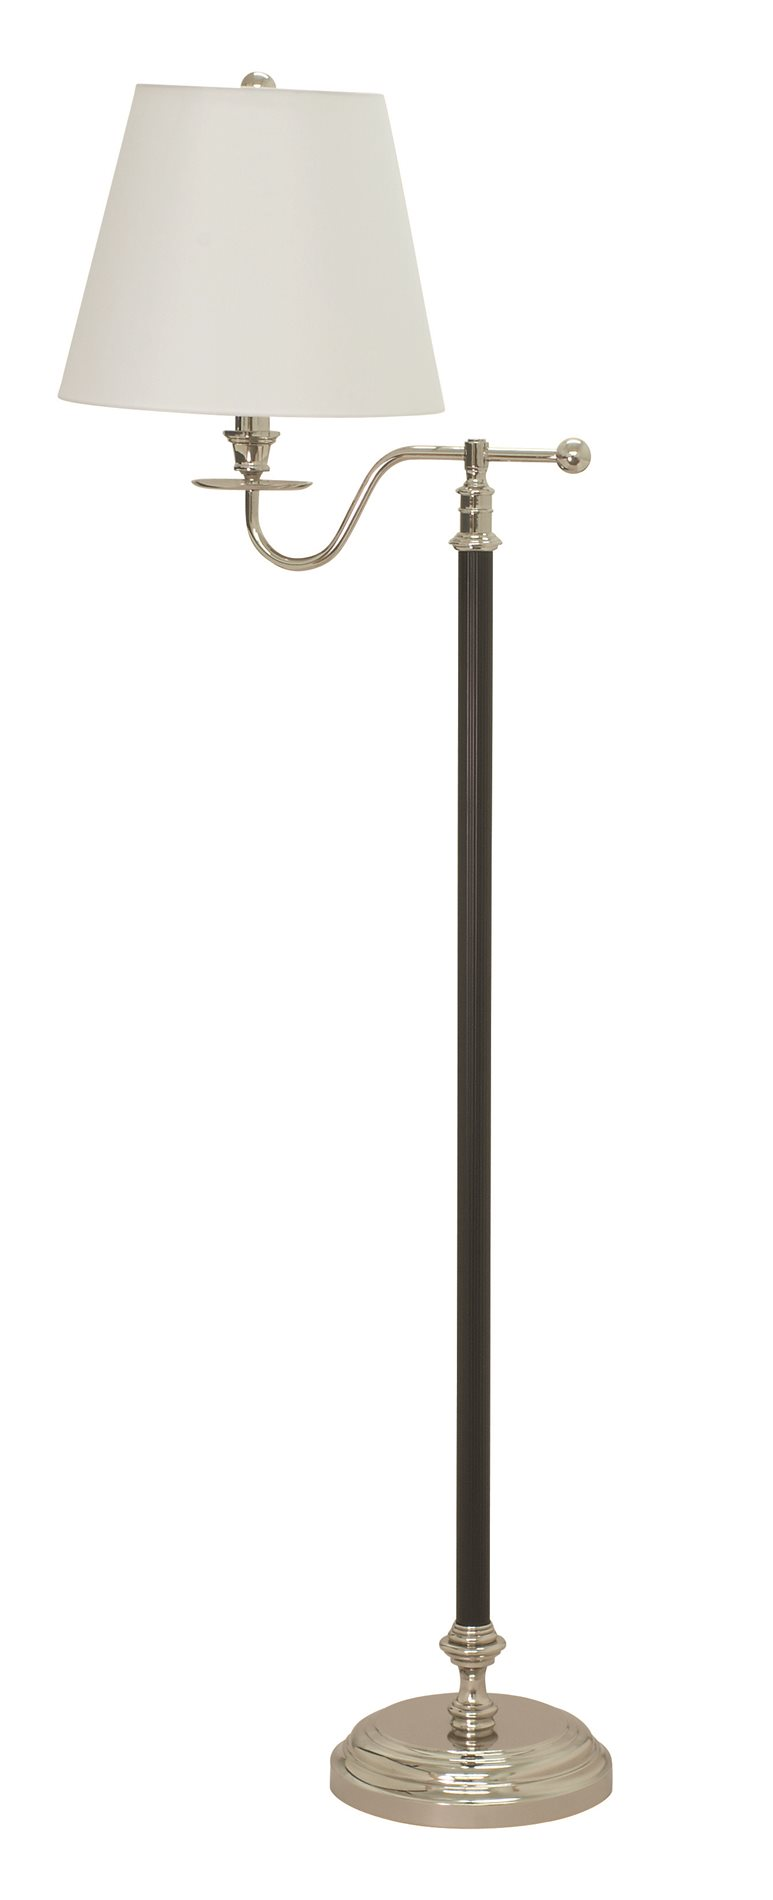 House Of Troy B502 BPN Bennington Floor Lamp HT B502 BPN